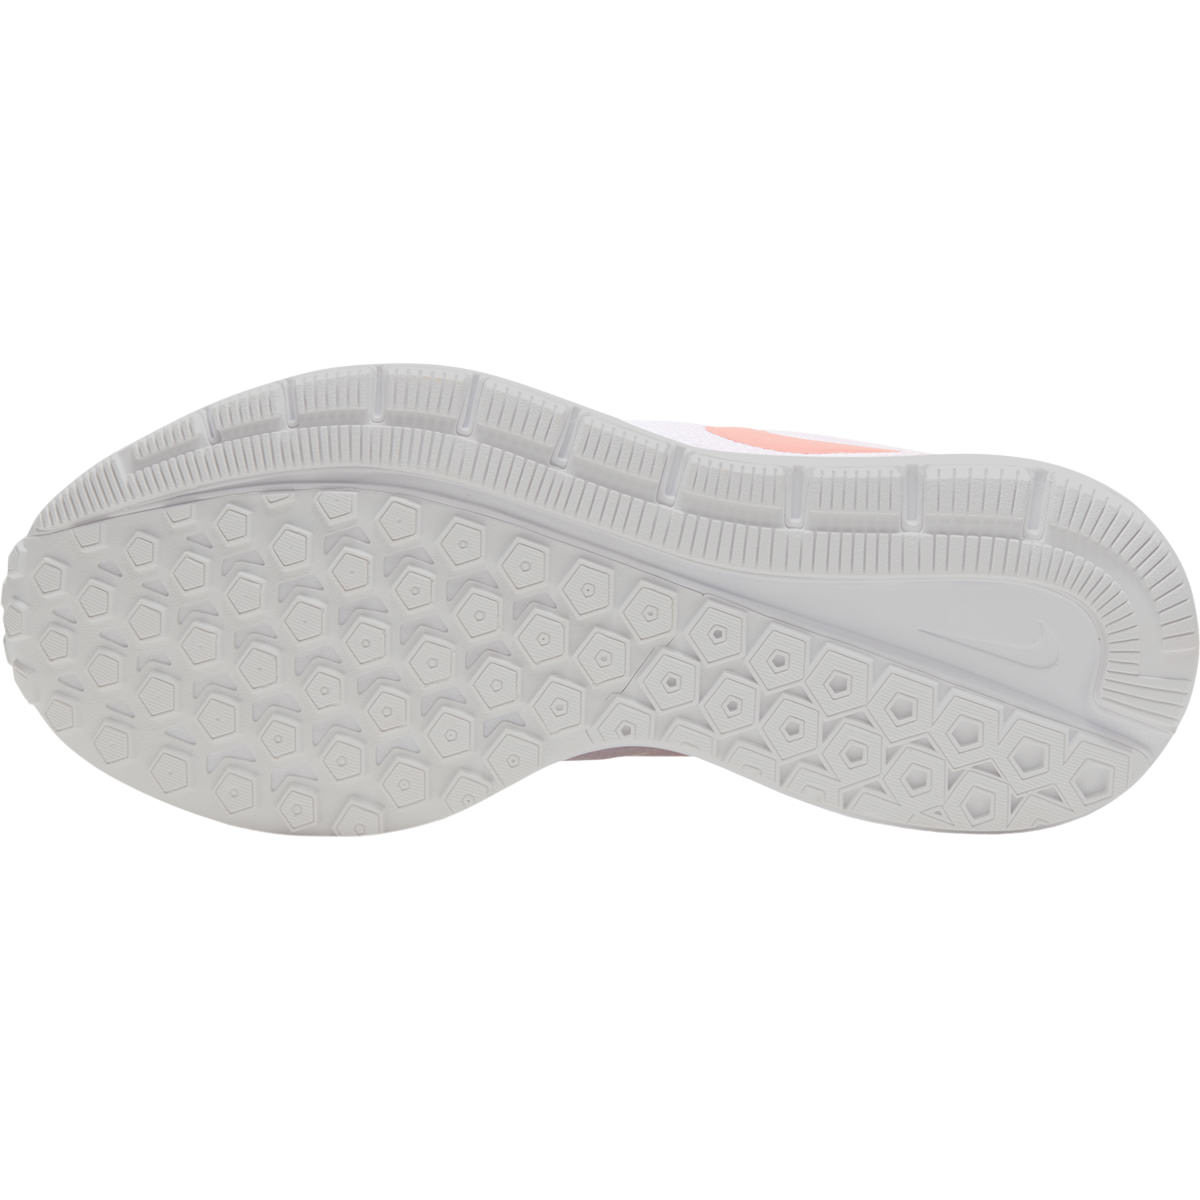 Nike Air Zoom Structure 22 Løbesko Dame